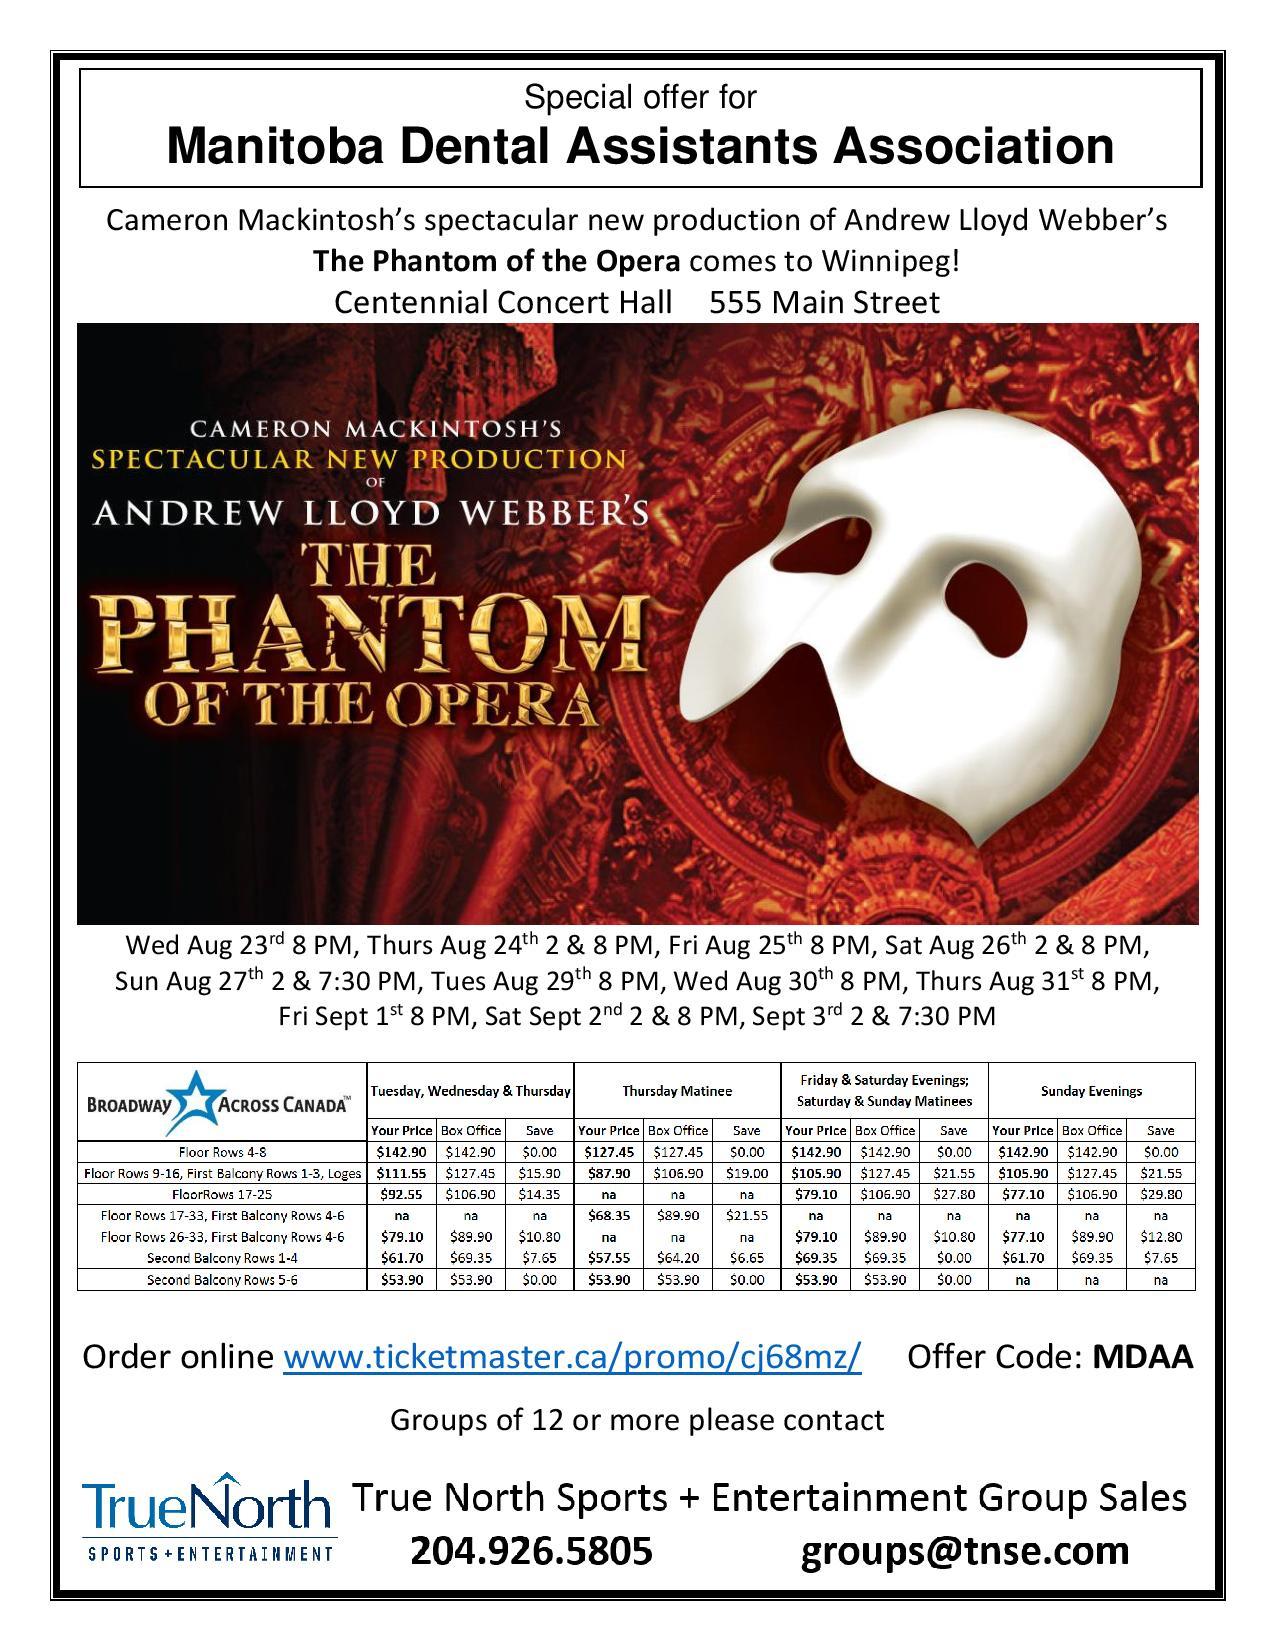 Phantom of the Opera offer_MDAA-page-001